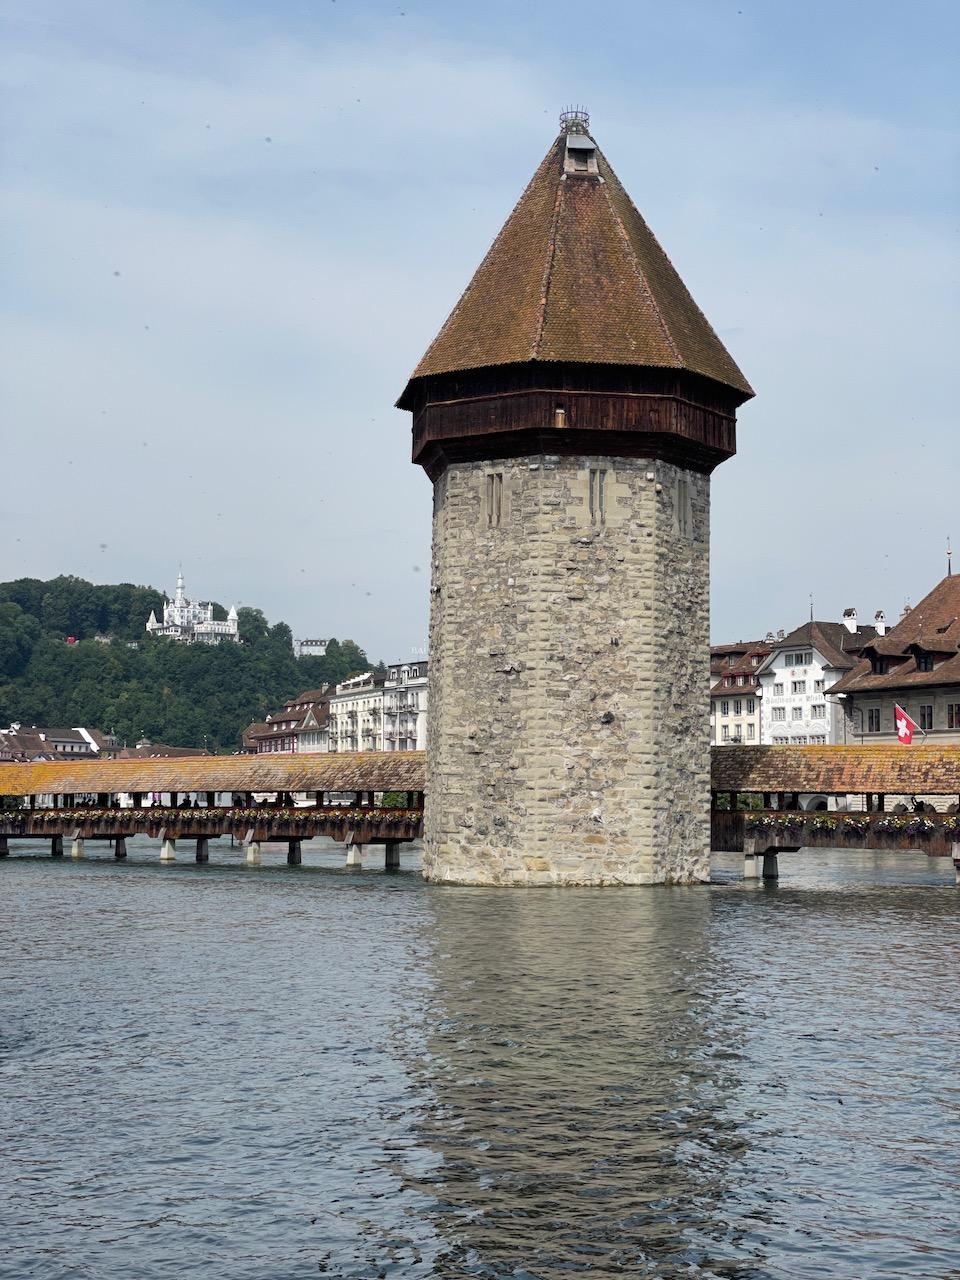 Kapellbrücke (Chapel Bridge) covered wooden footbridge spanning the river Reuss diagonally in the city of Lucerne in central Switzerland